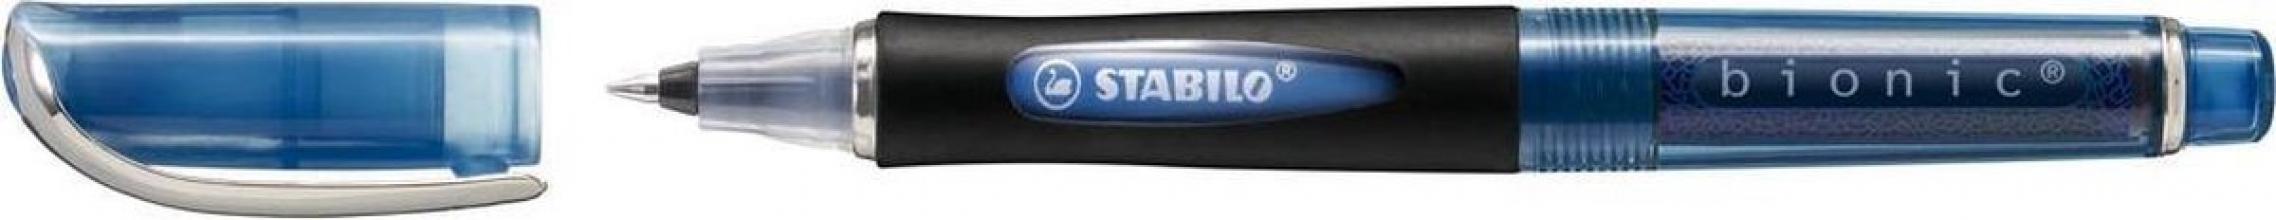 , Rollerpen STABILO Bionic blauw